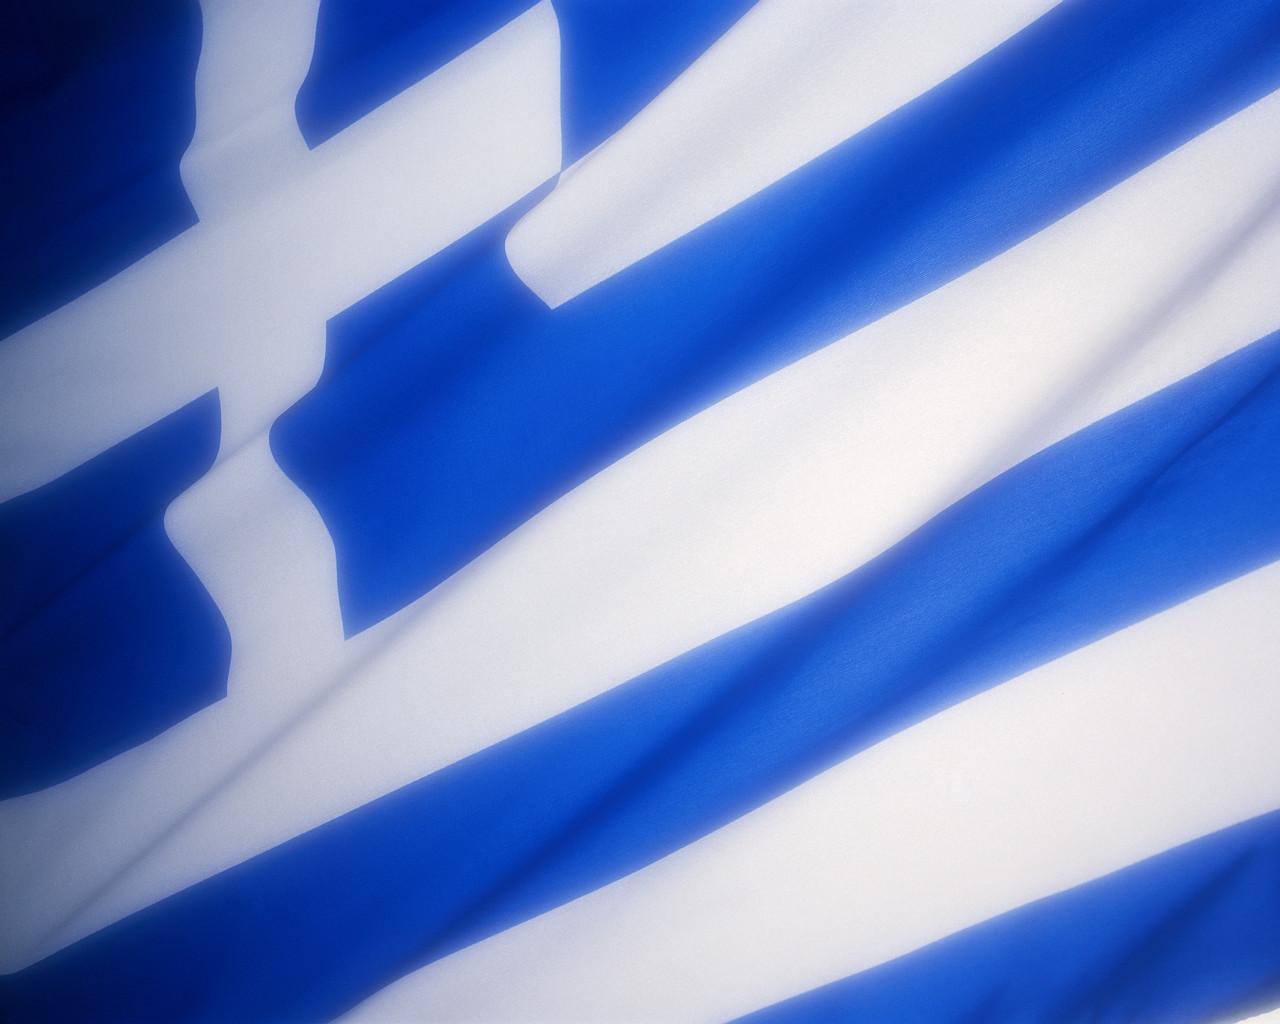 http://4.bp.blogspot.com/-fMbxPNobQJY/TfypM2lYR5I/AAAAAAAAAXU/_LREsnp-YQE/s1600/greekflag.jpg